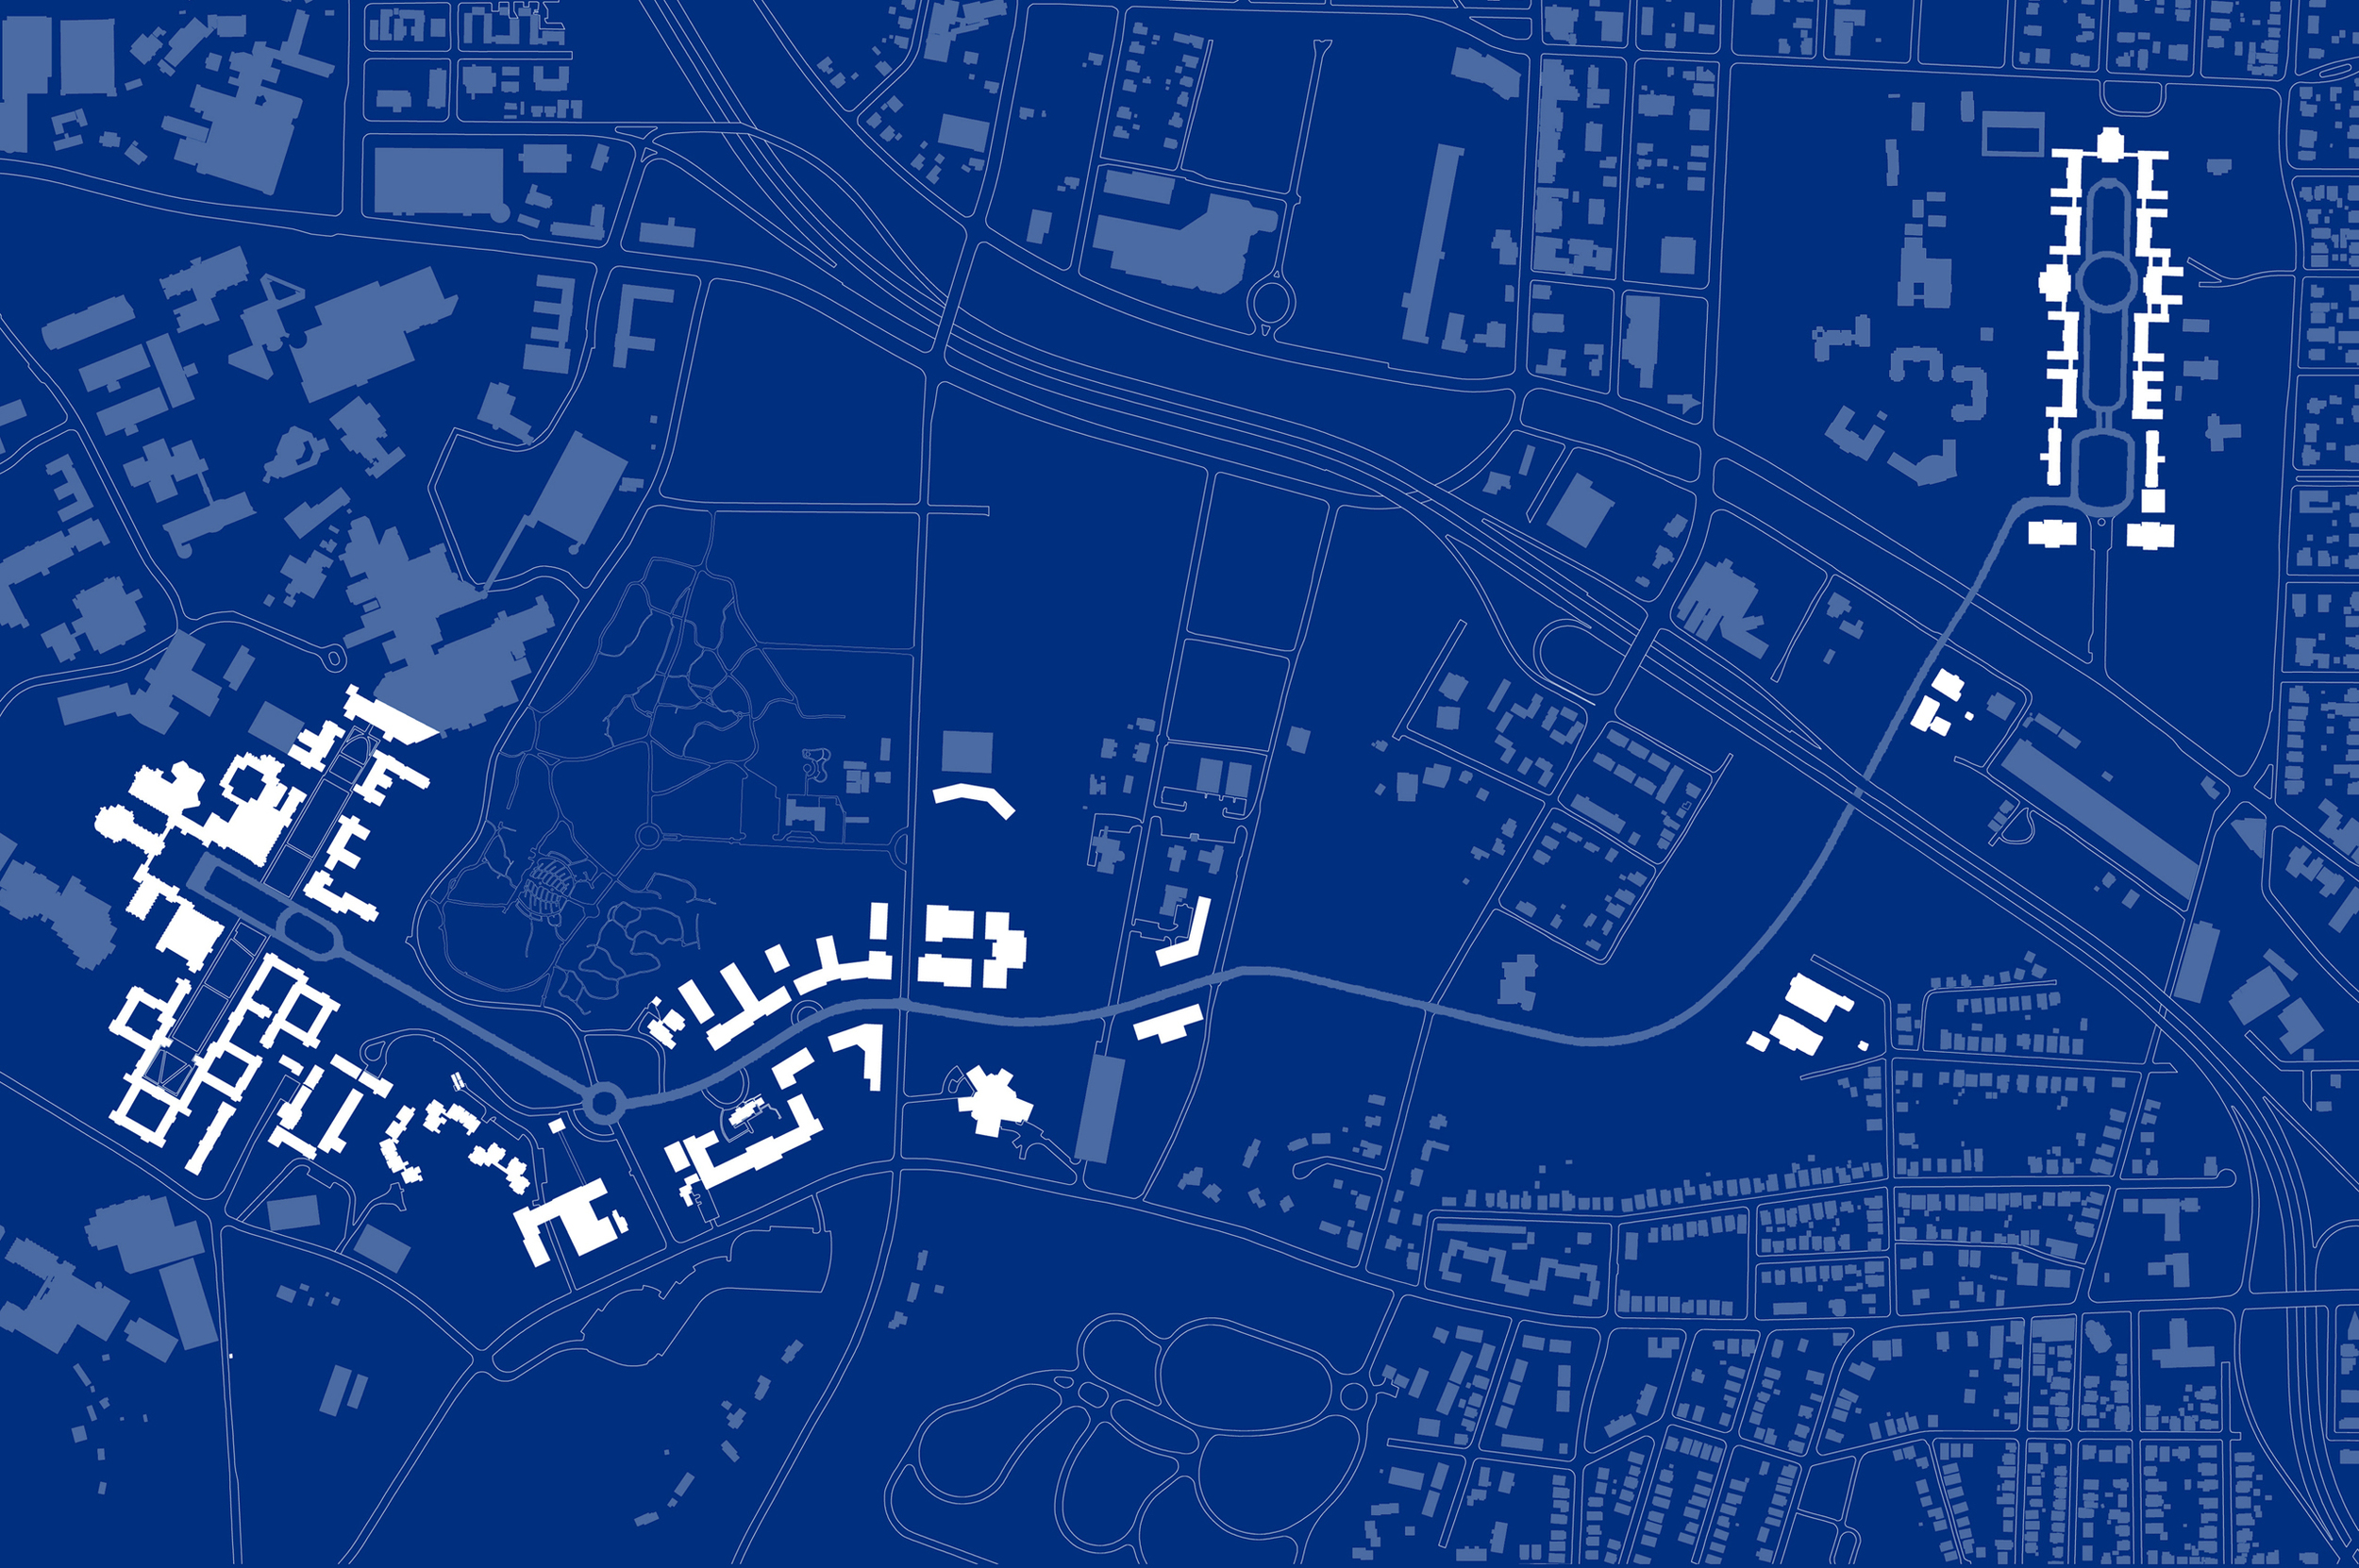 BA_dukemasterplan_diagram.jpg